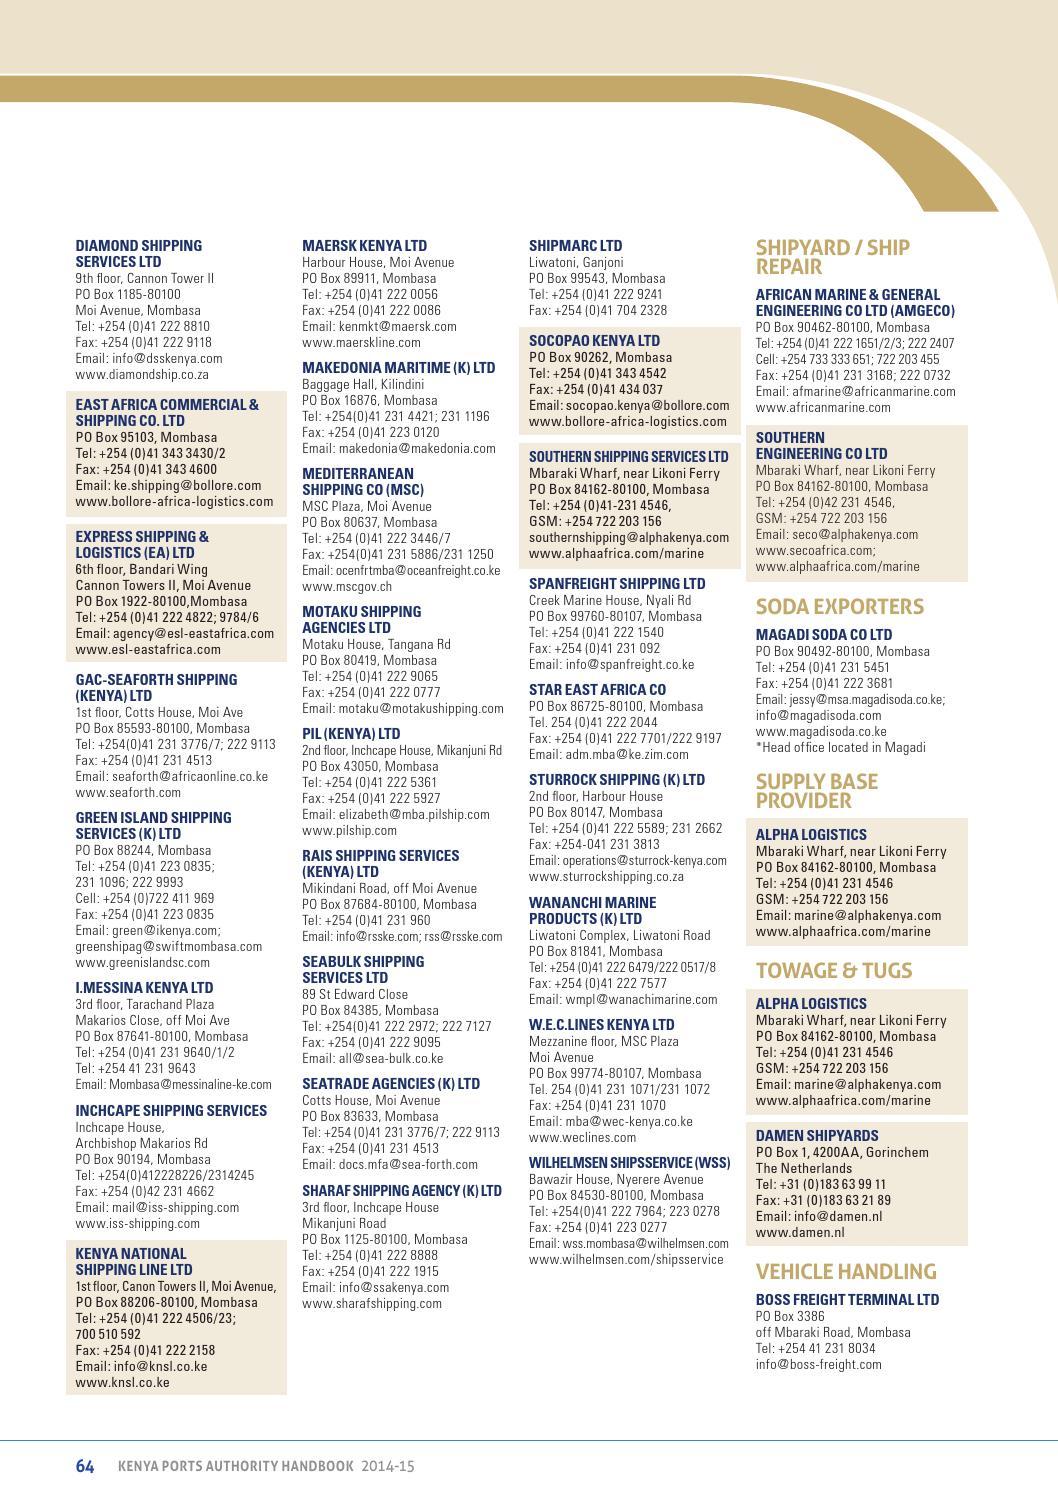 Kenya Ports Authority Handbook 2014 by Land & Marine